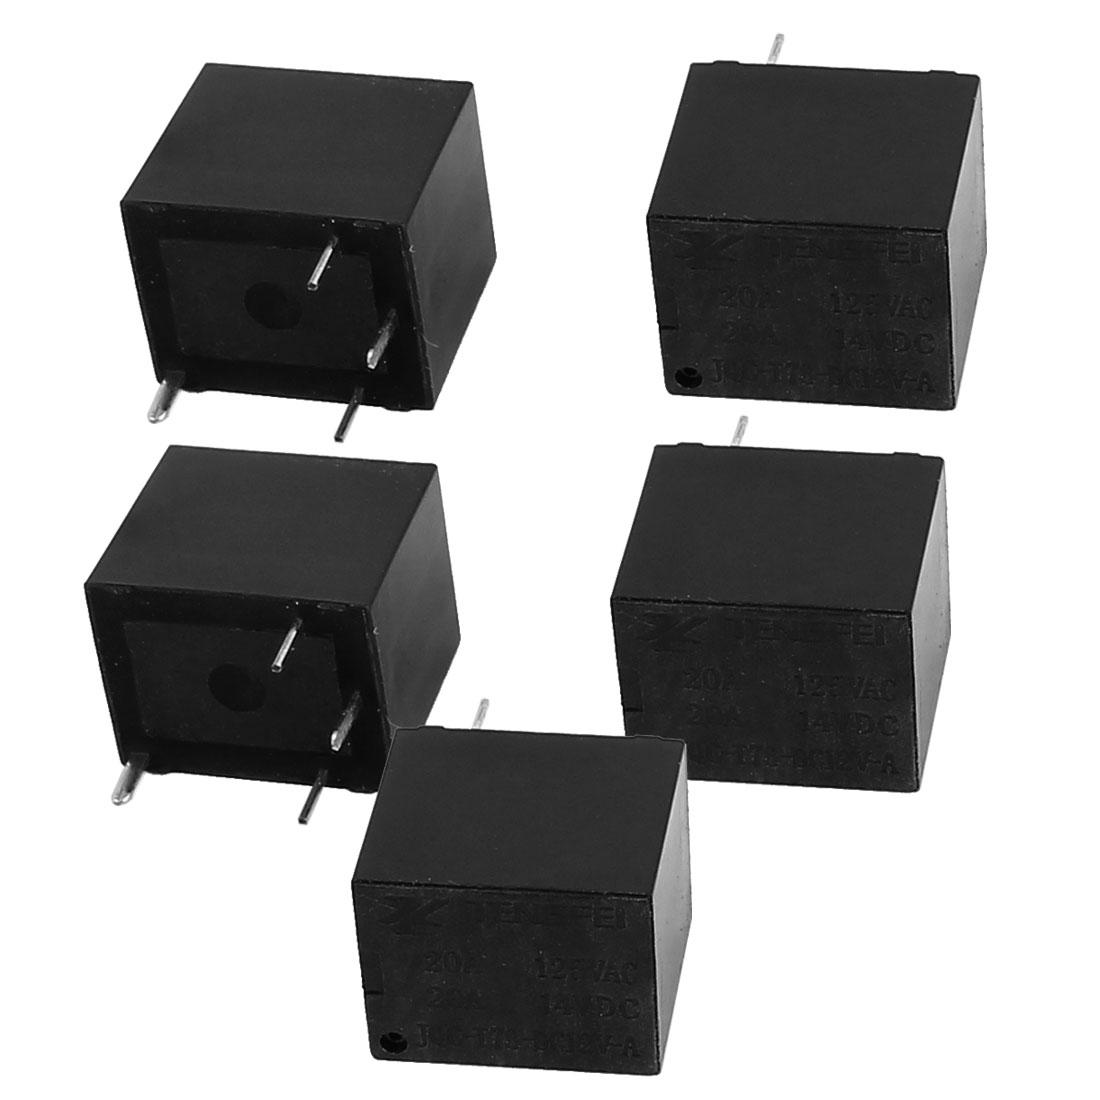 5Pcs DC12V 20A 0.6W 4 Terminal SPST NO Mini Power Coil Electromagnetic Relay